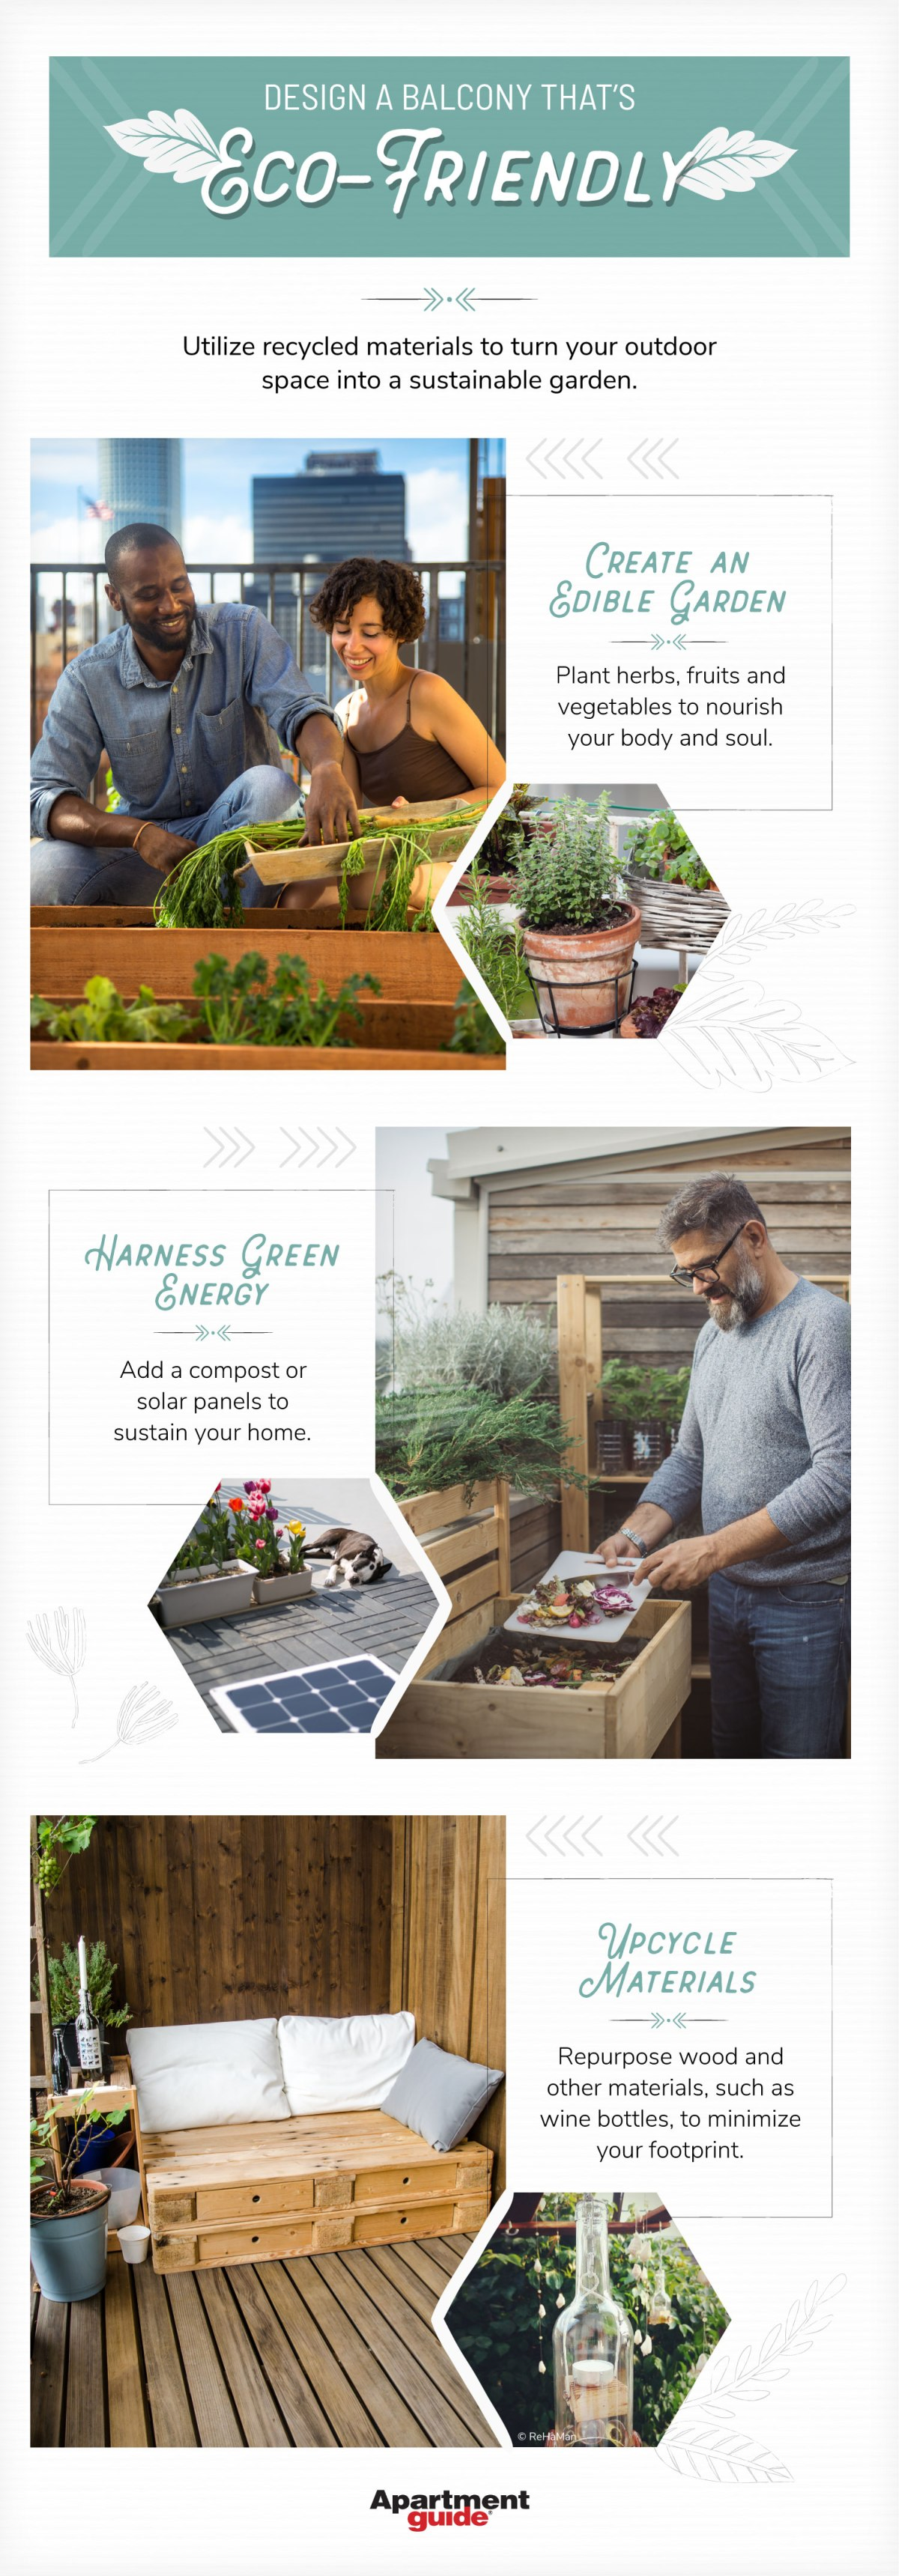 Ways to Construct an Eco-Friendly Balcony Garden [Visual] | ecogreenlove